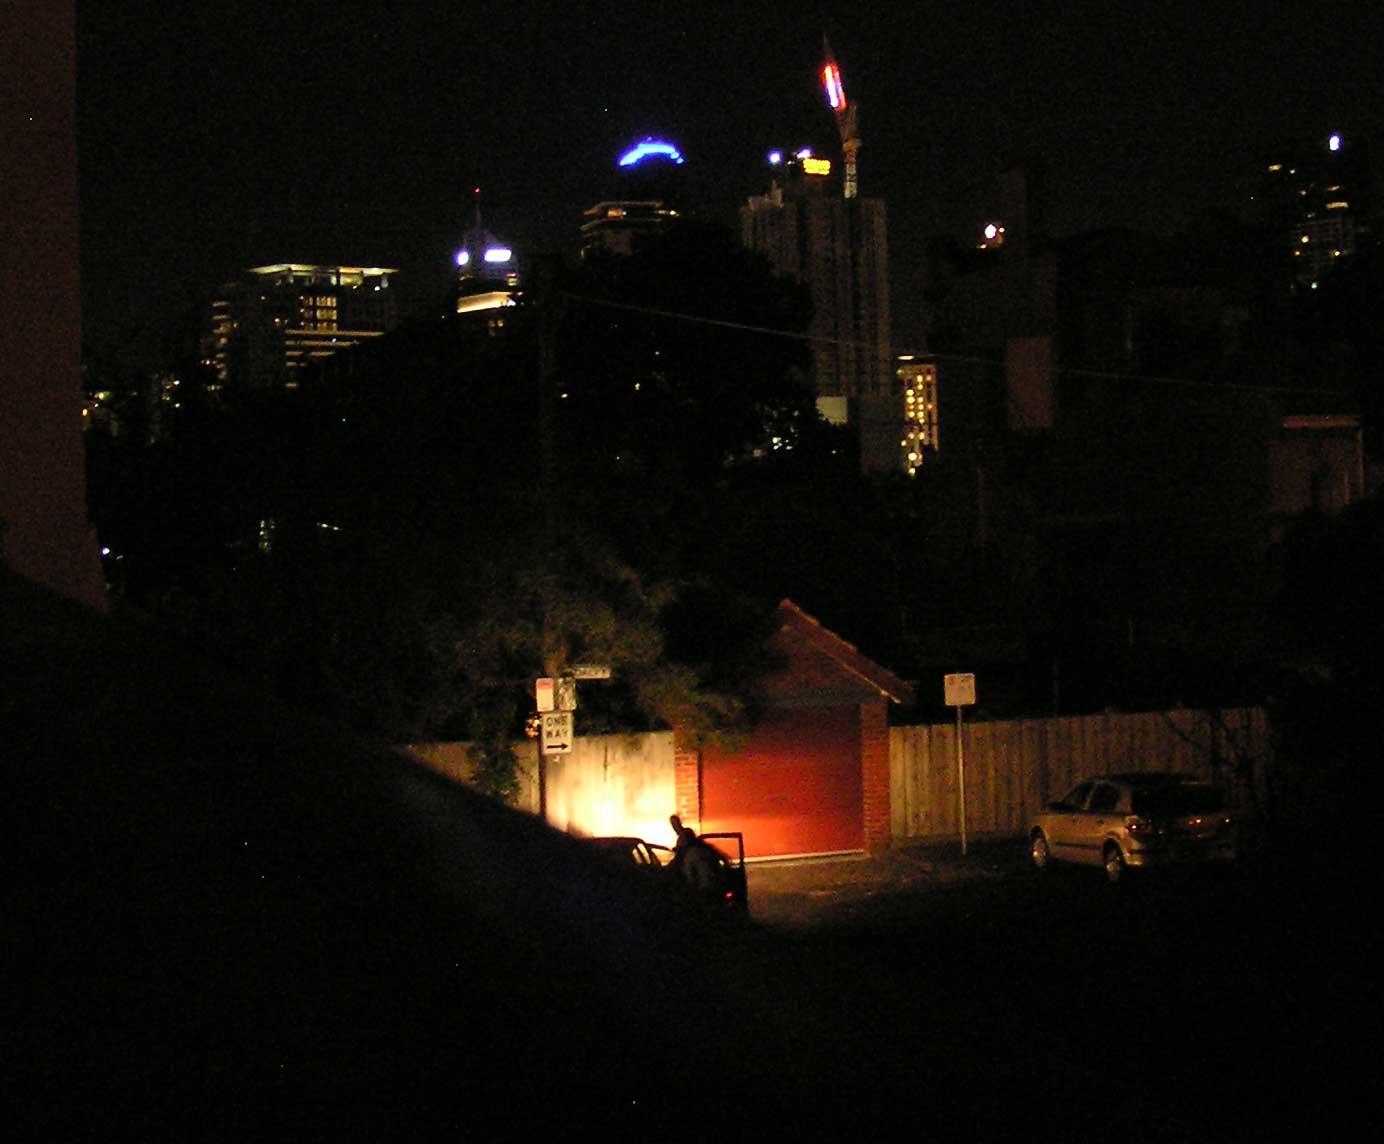 melb-nightWR